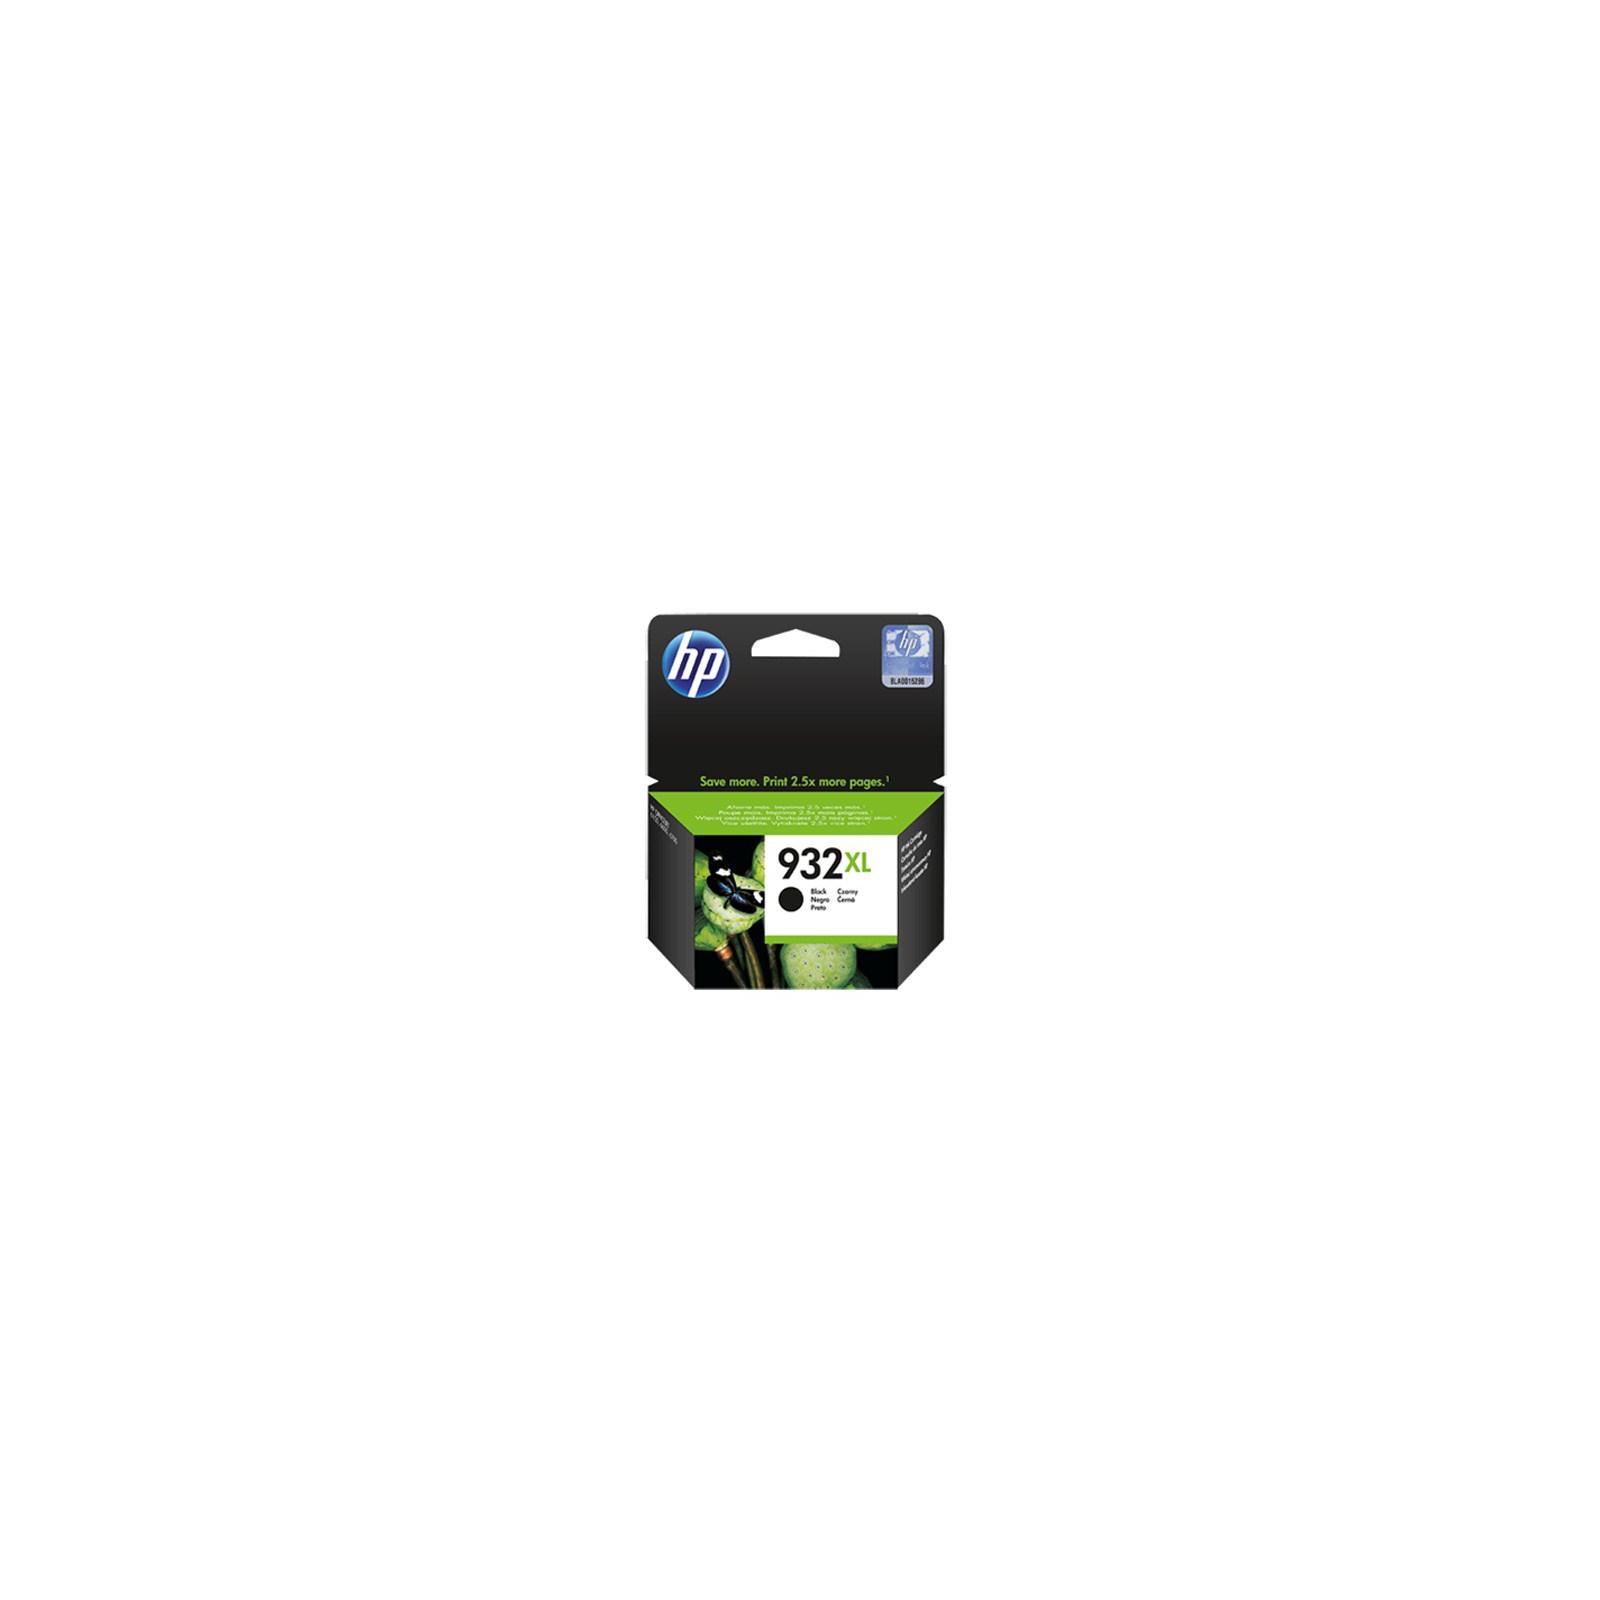 Картридж HP DJ No.932XL OJ 6700 Premium Black (CN053AE)